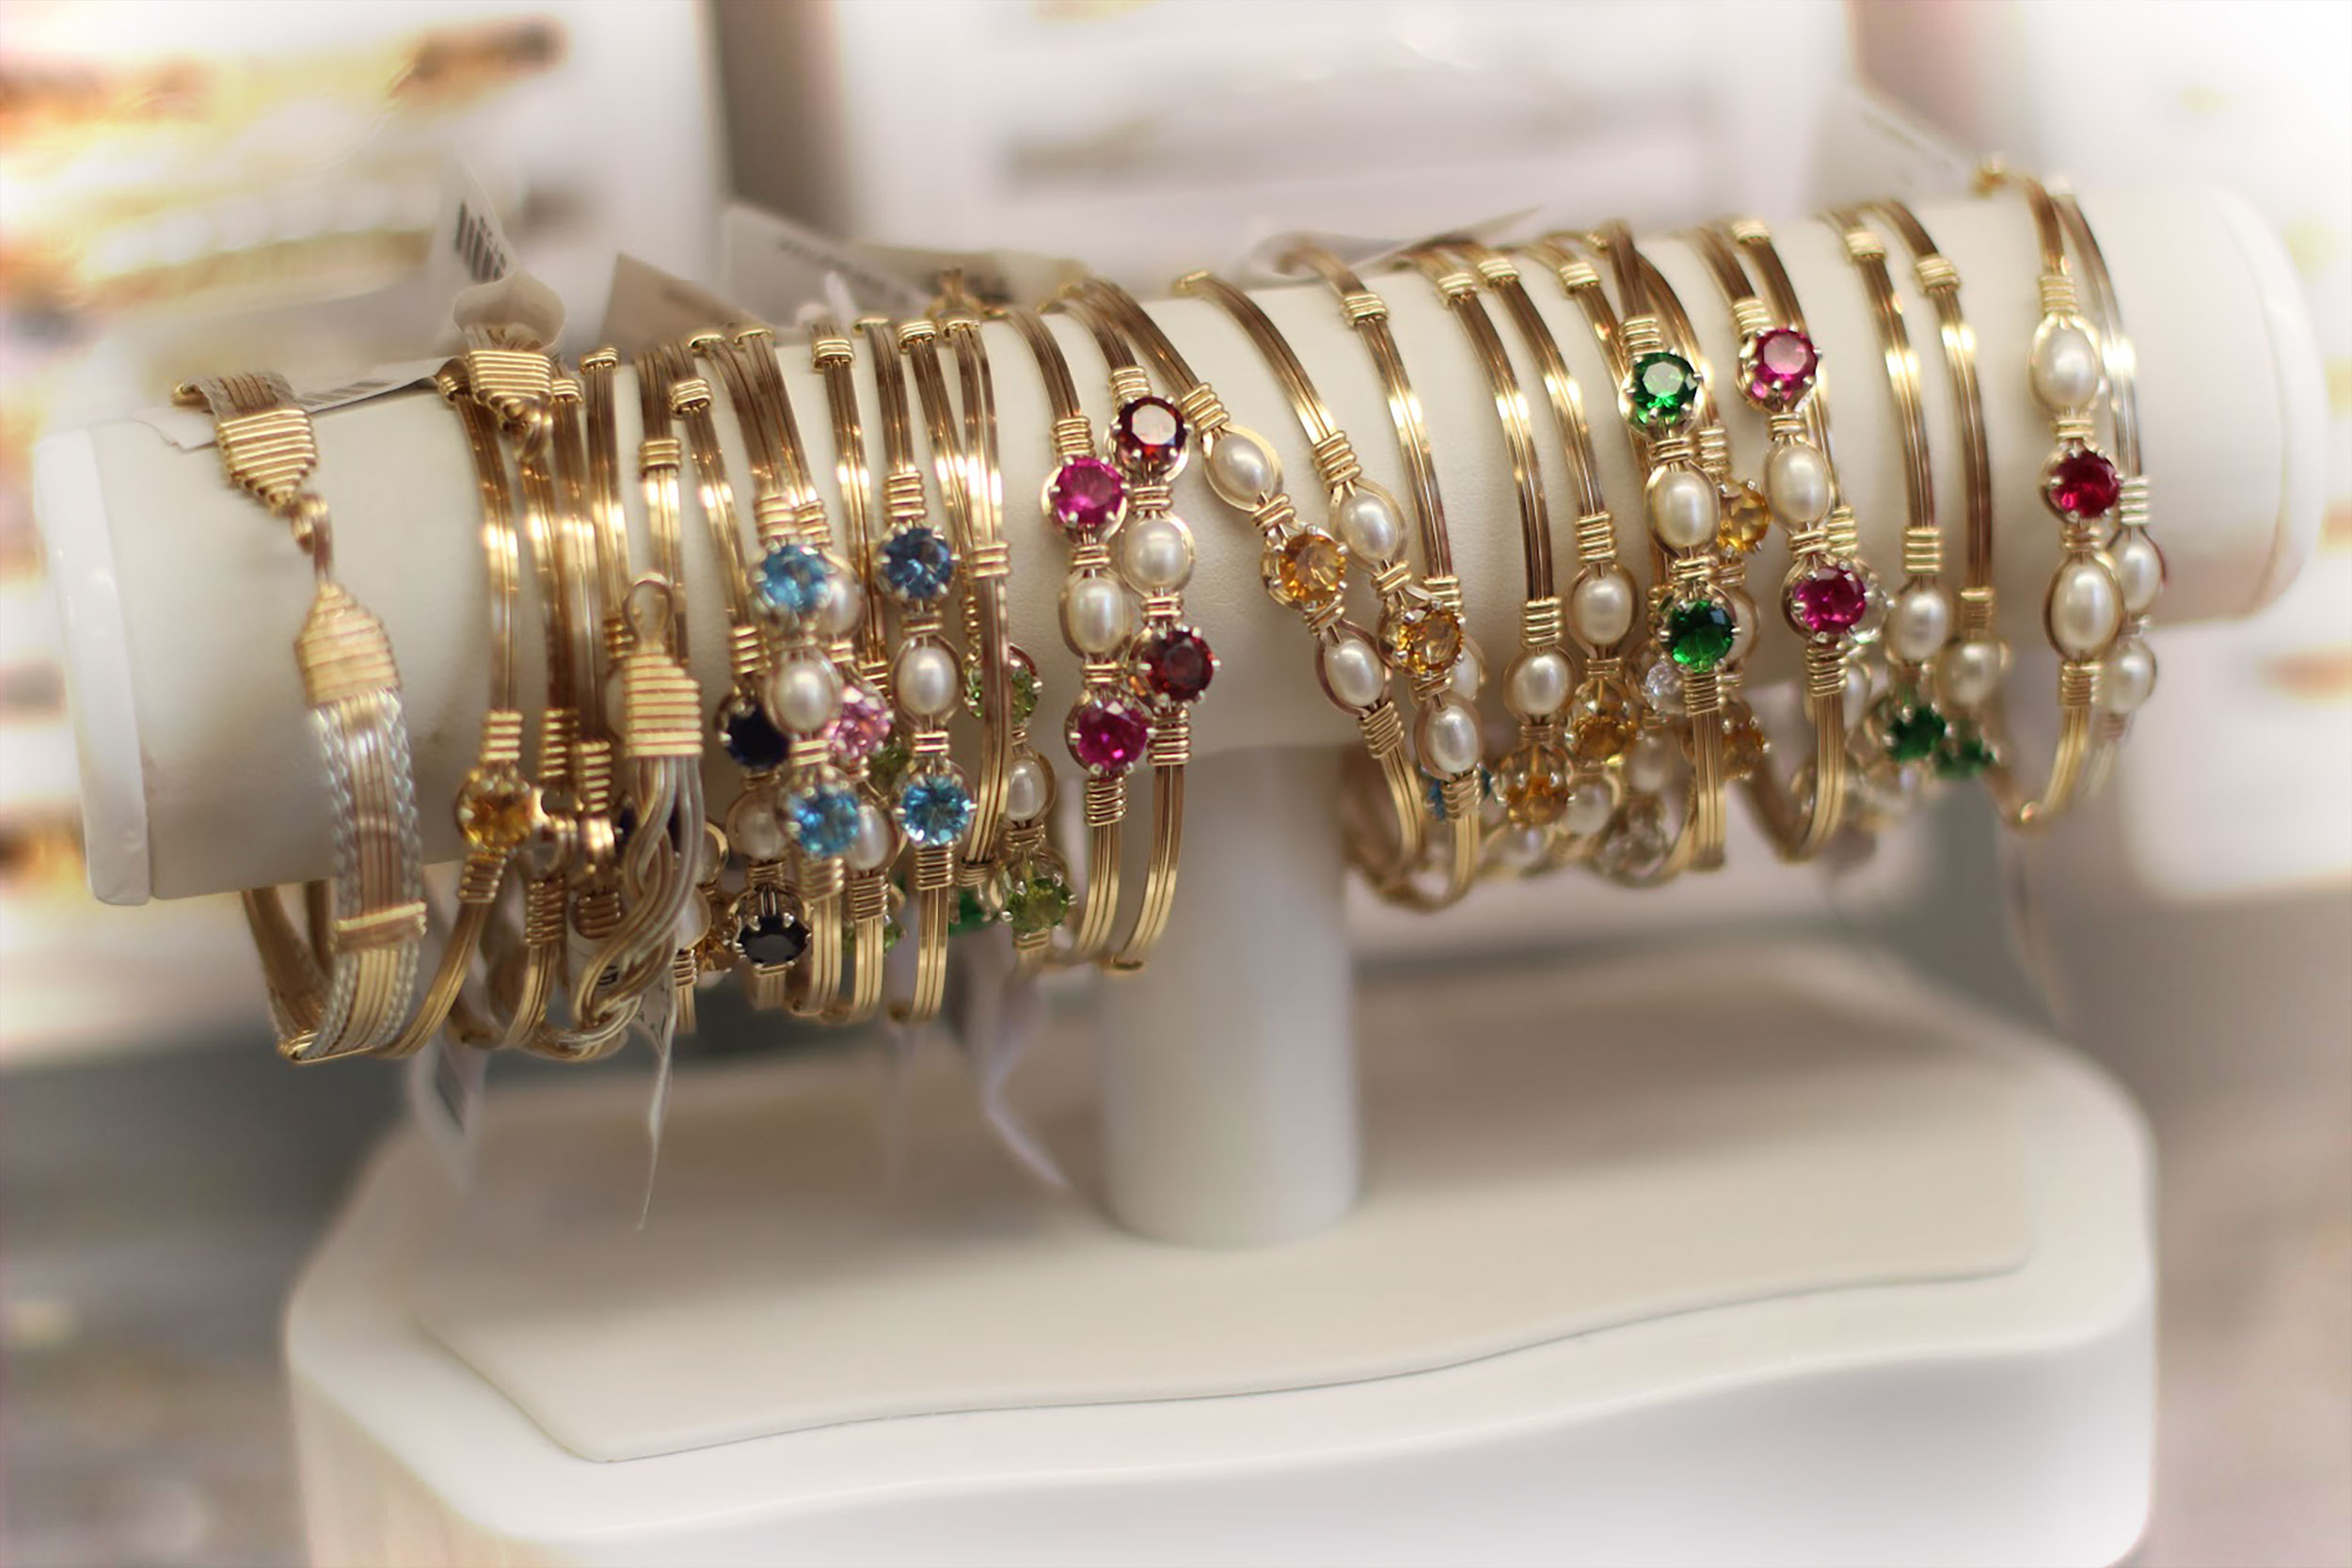 Ronaldo Designer Jewelry at Regel & Company